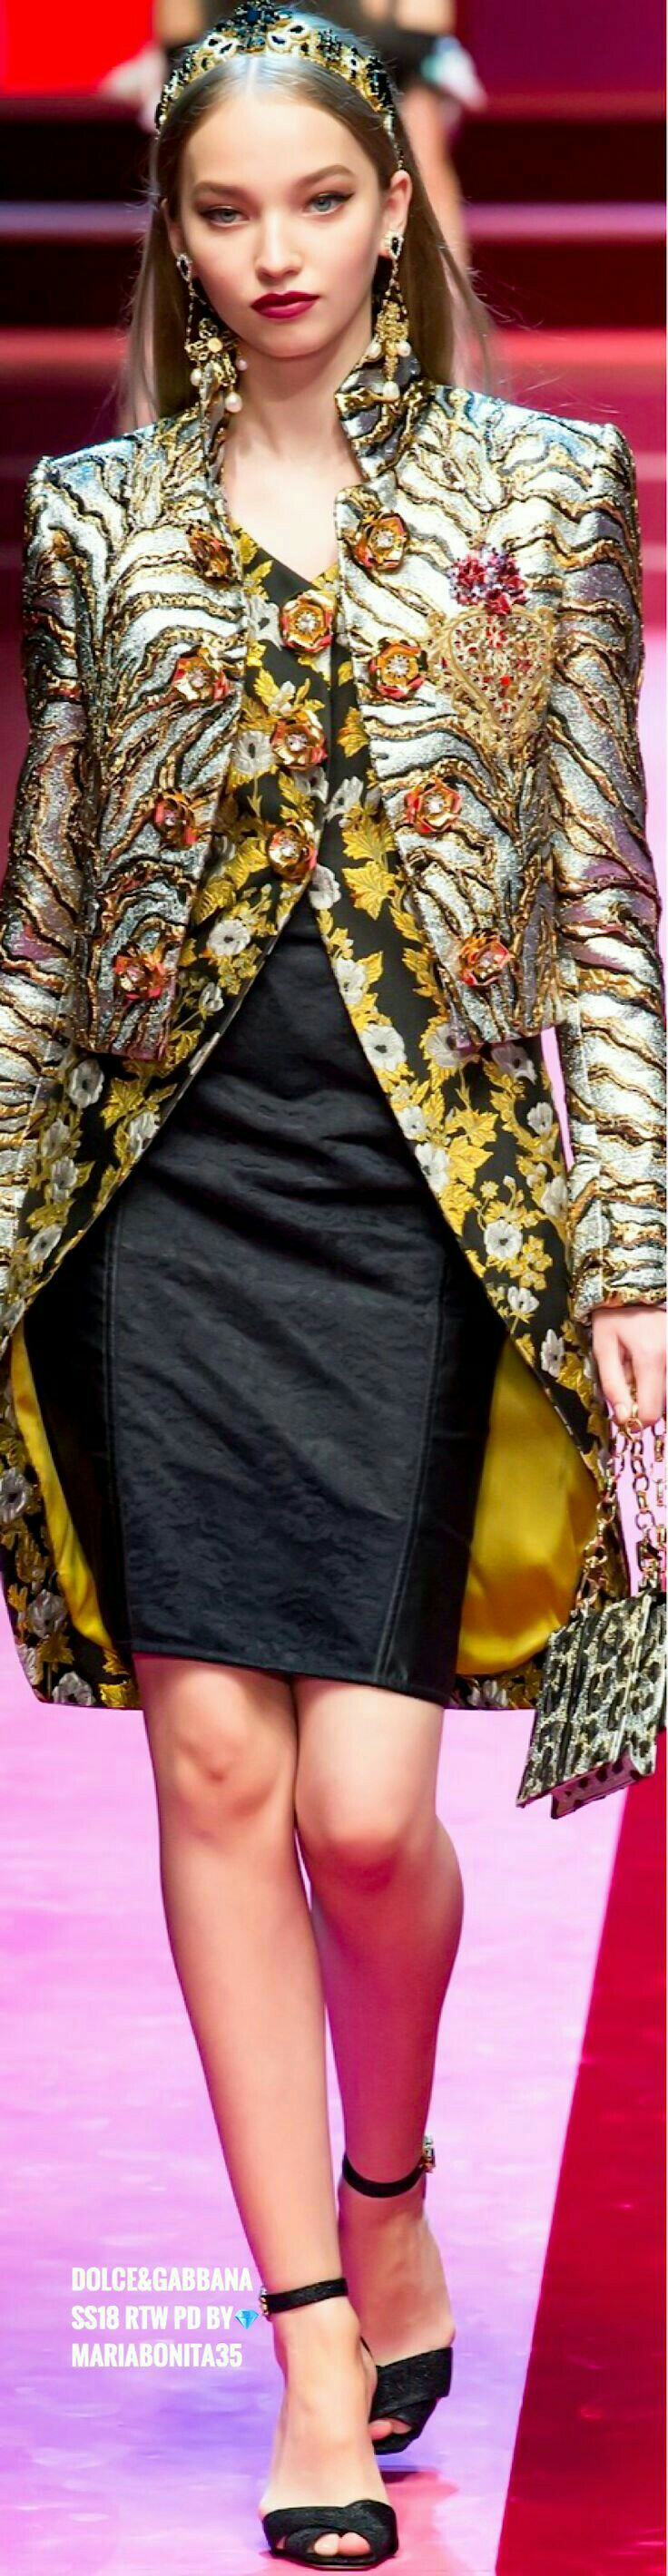 Pin by Josè E. on CHIC   Fashion, Fashion trend board, New